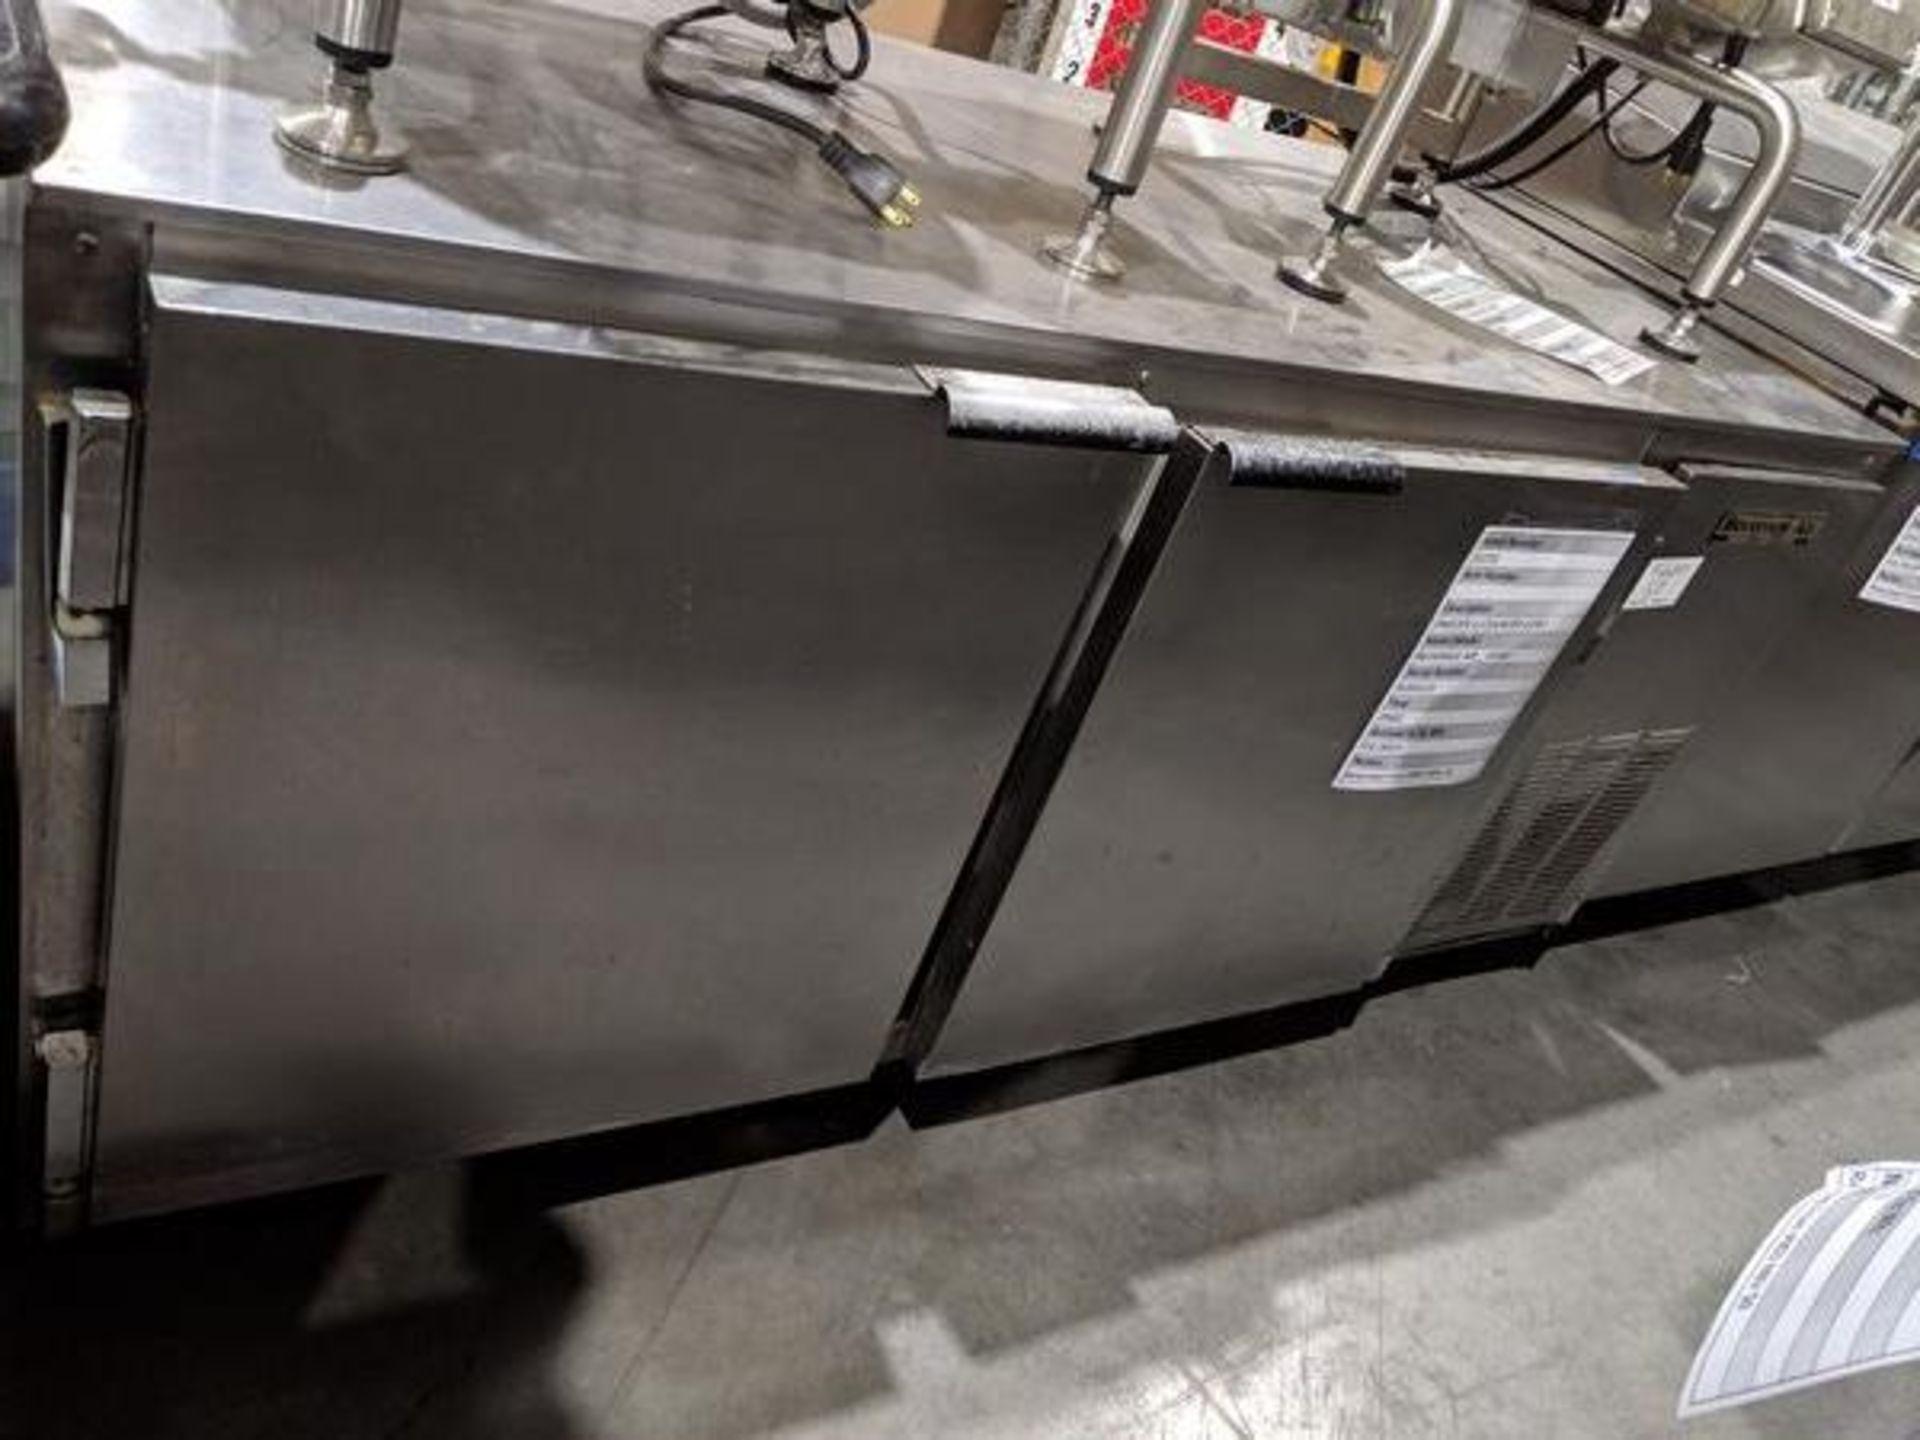 Lot 50 - Beverage Air Model UFC67 Undercounter Freezer